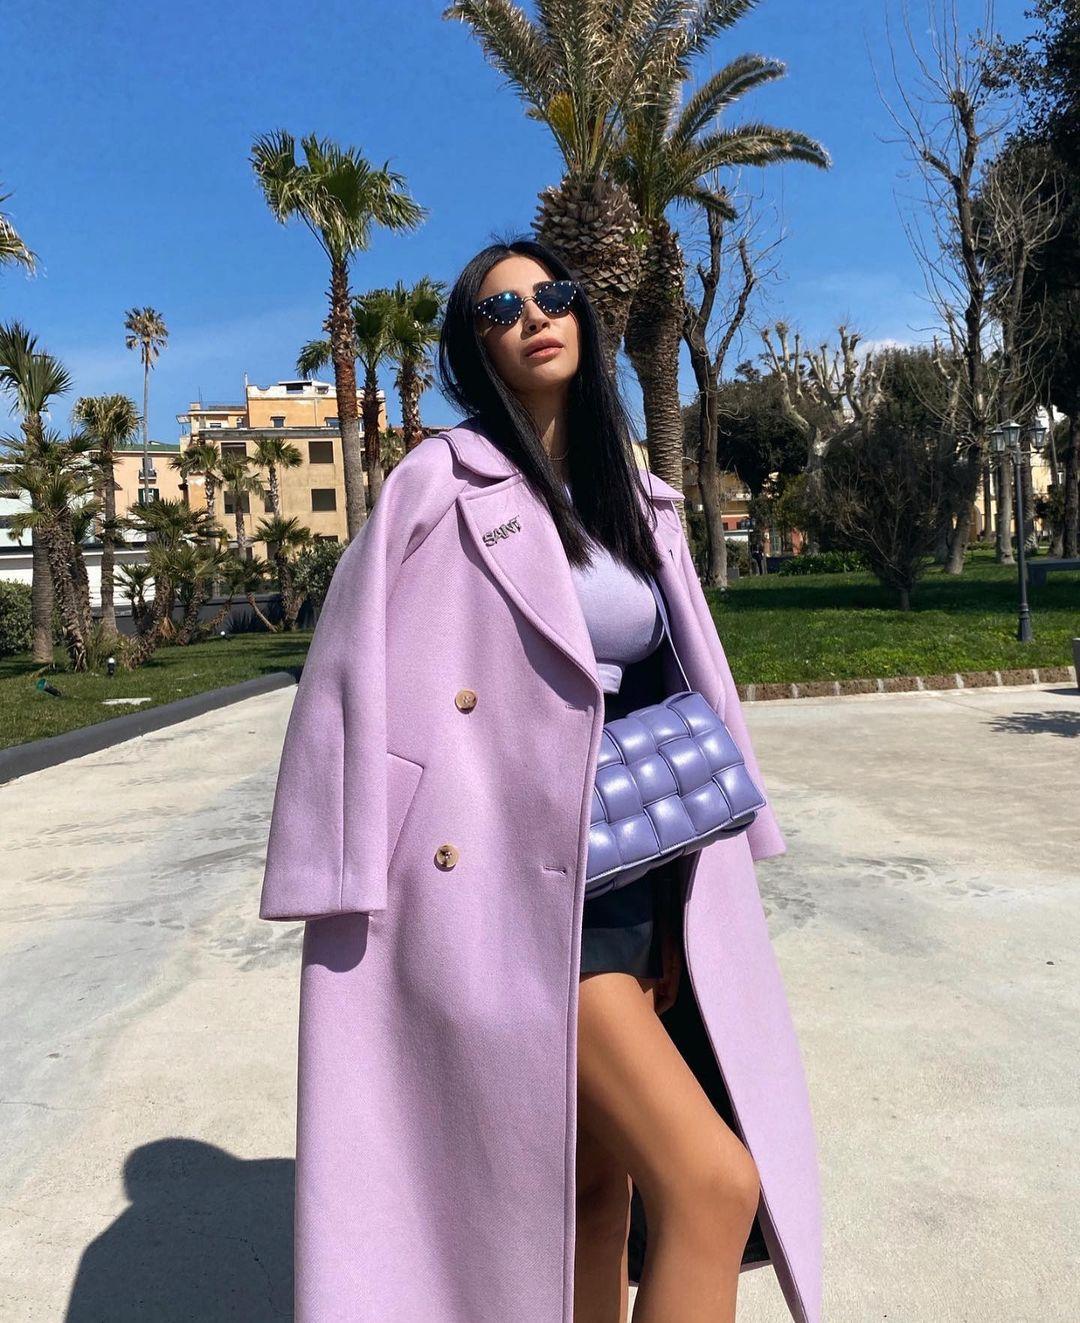 manteau avec laine limited edition de Zara sur zara.mania